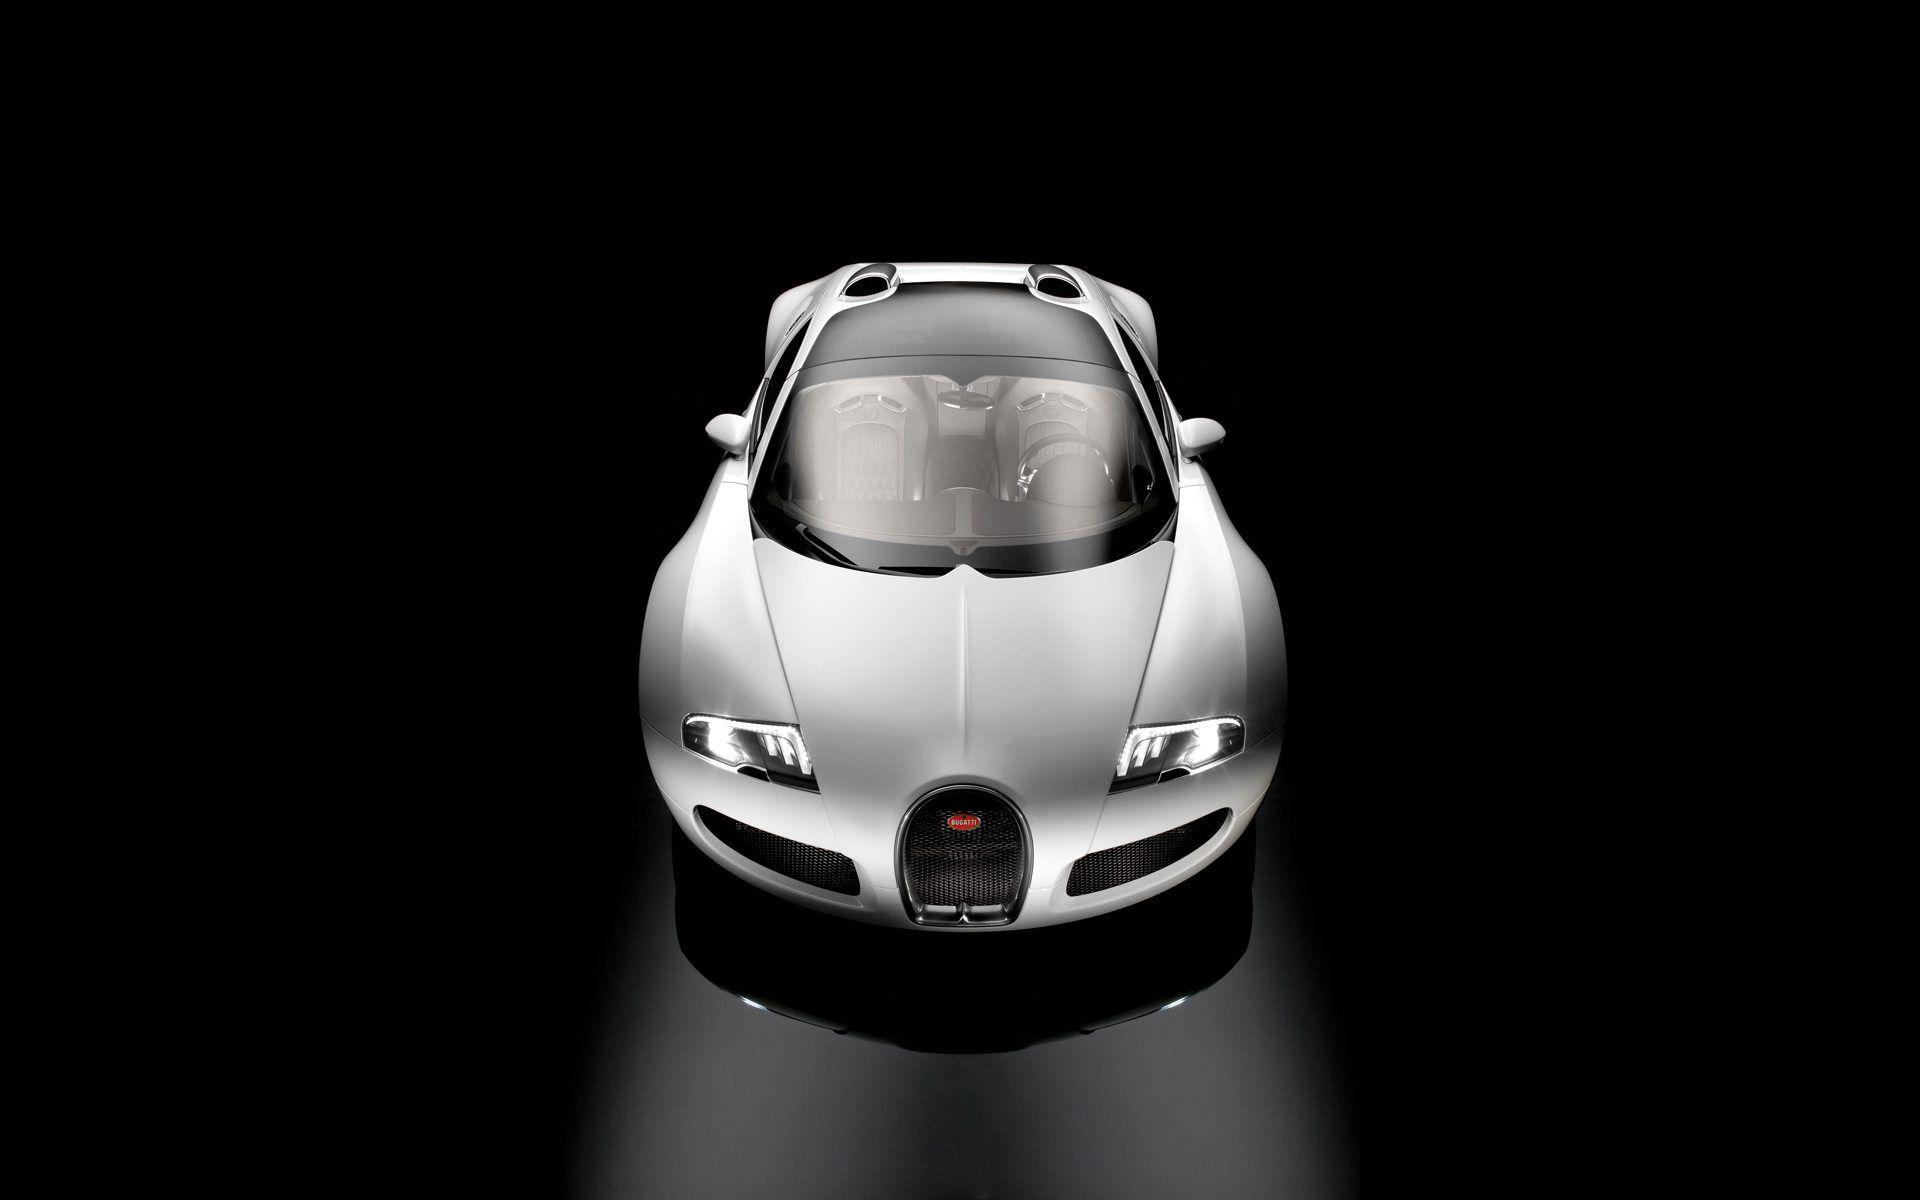 dbd02cbcbf565de0b6cac45f08456161 Inspiring Bugatti Veyron Quarter Mile Speed Cars Trend